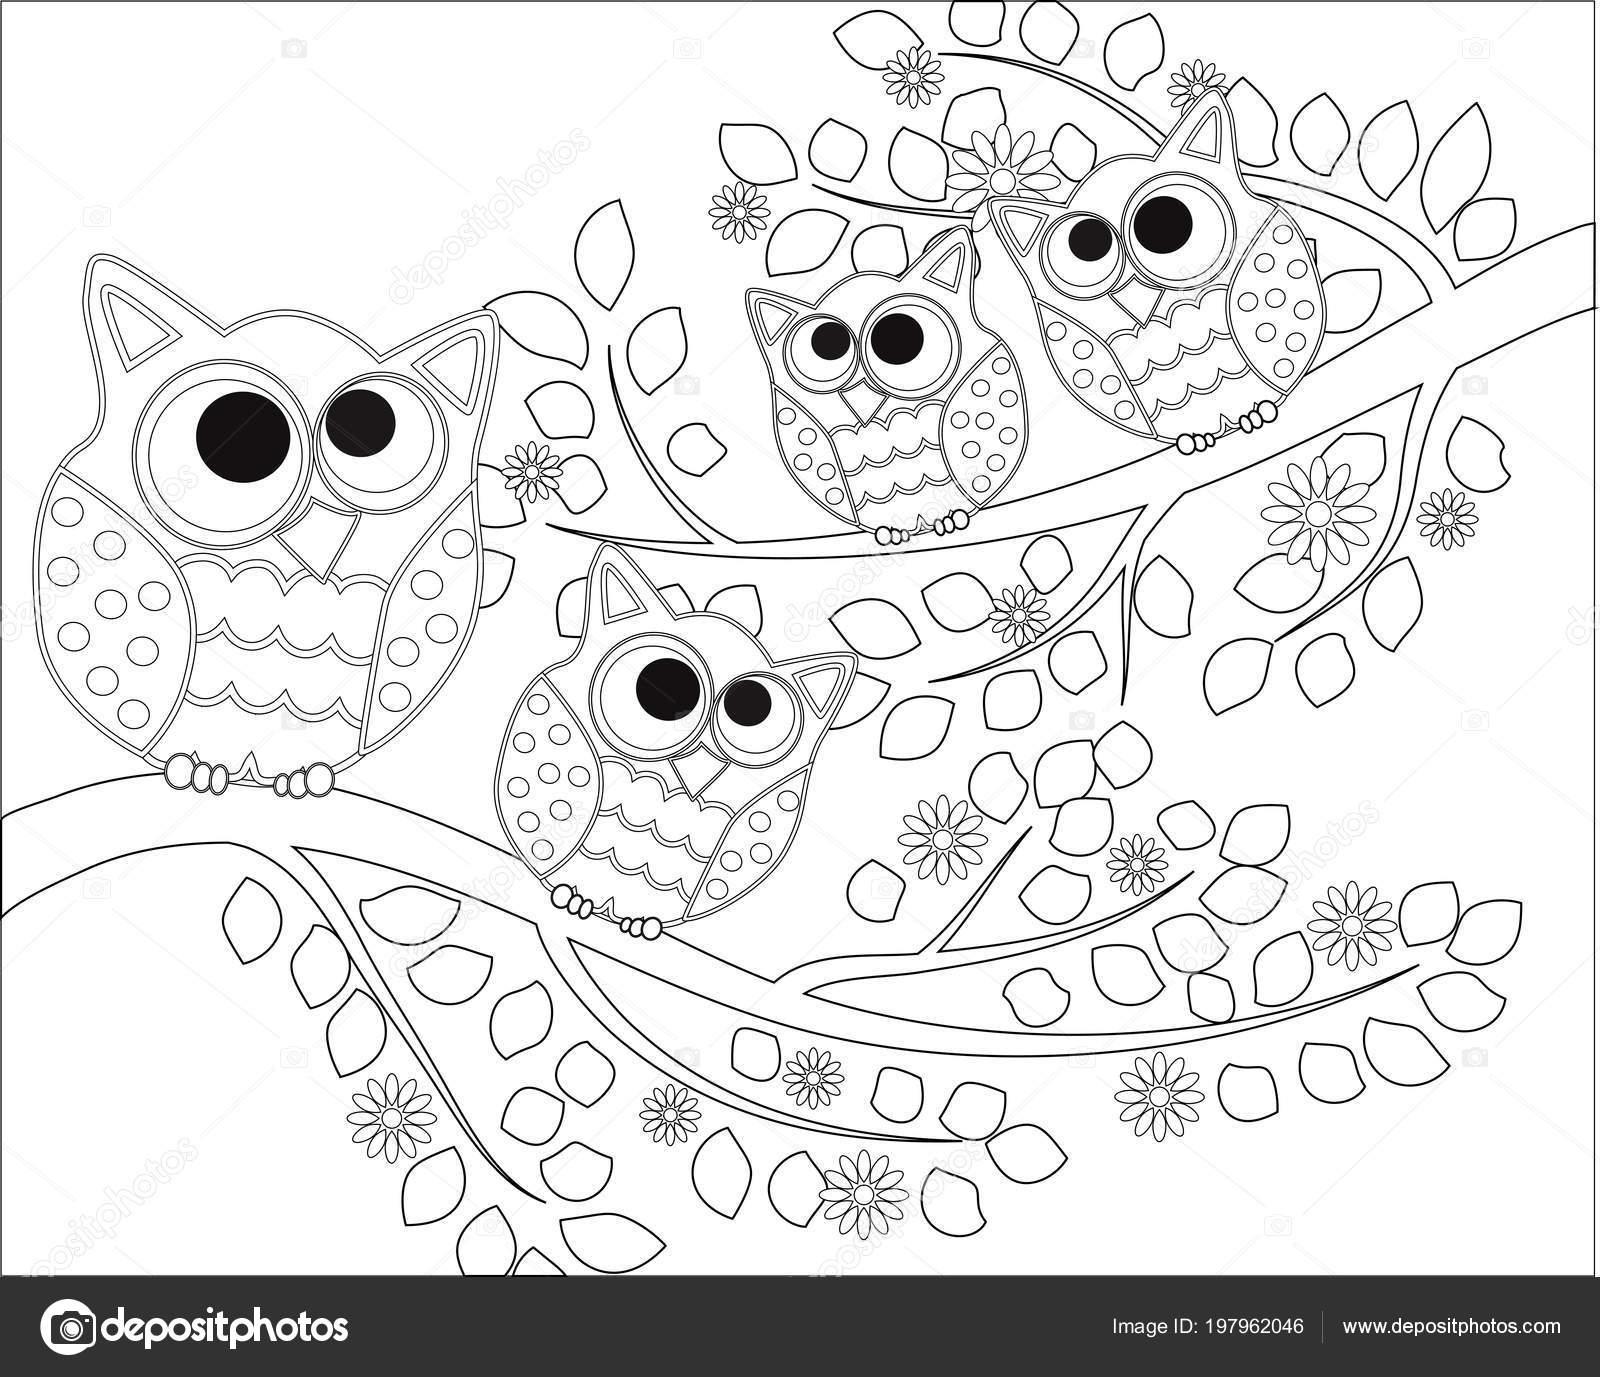 depositphotos stock illustration coloring book adult older children